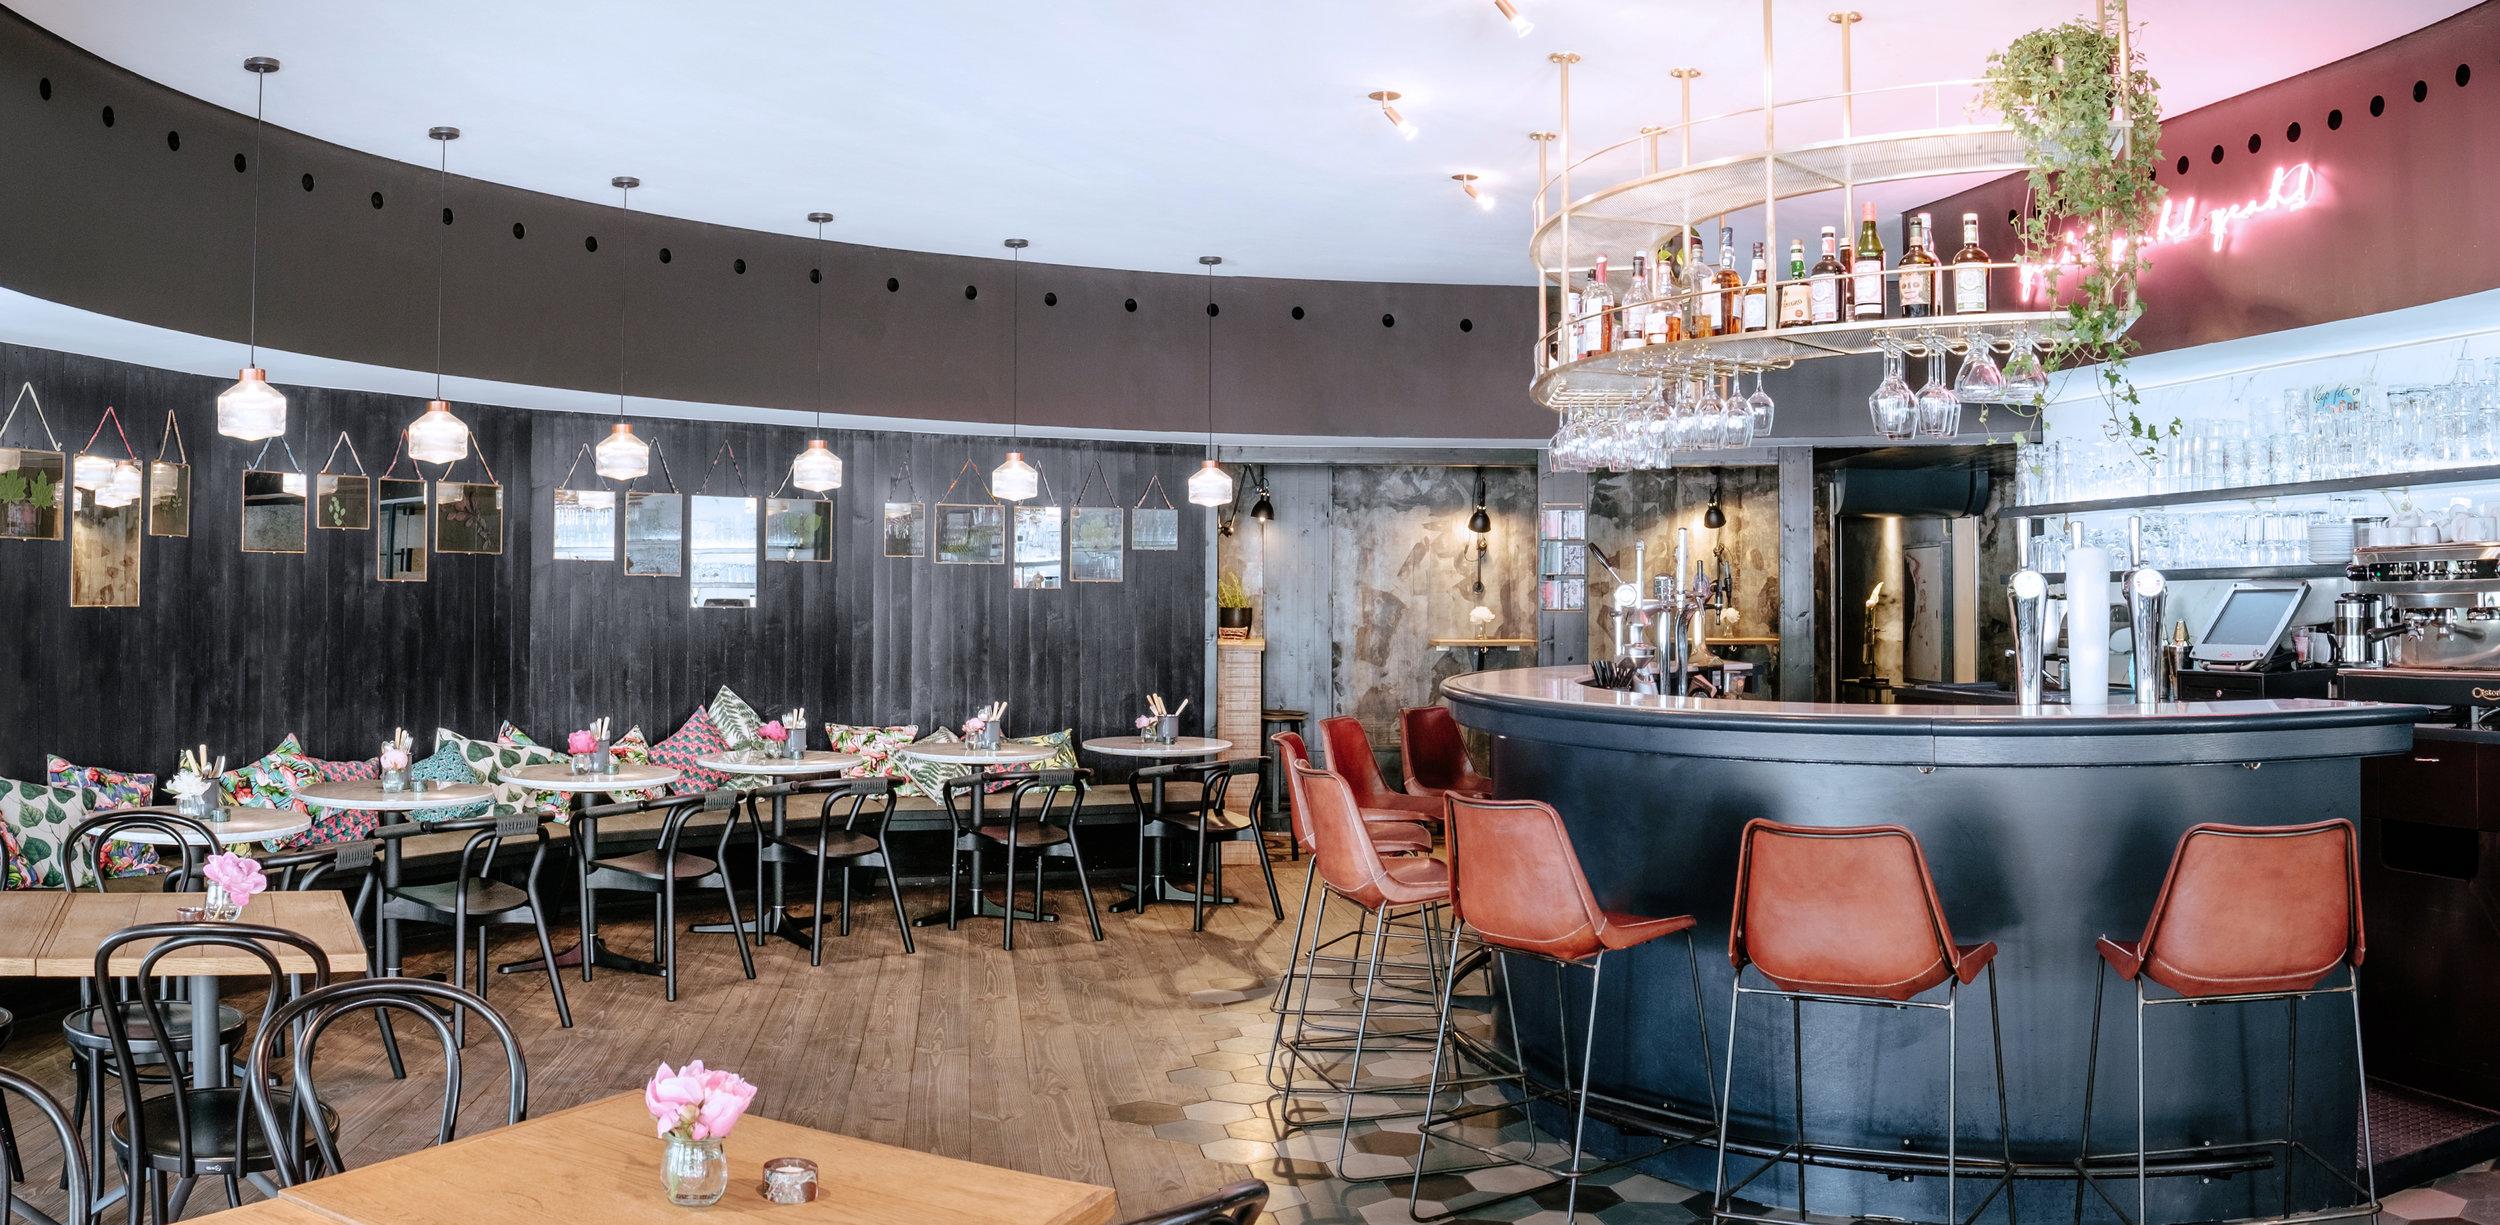 Pavillon Bar & Kitchen panorama.jpg